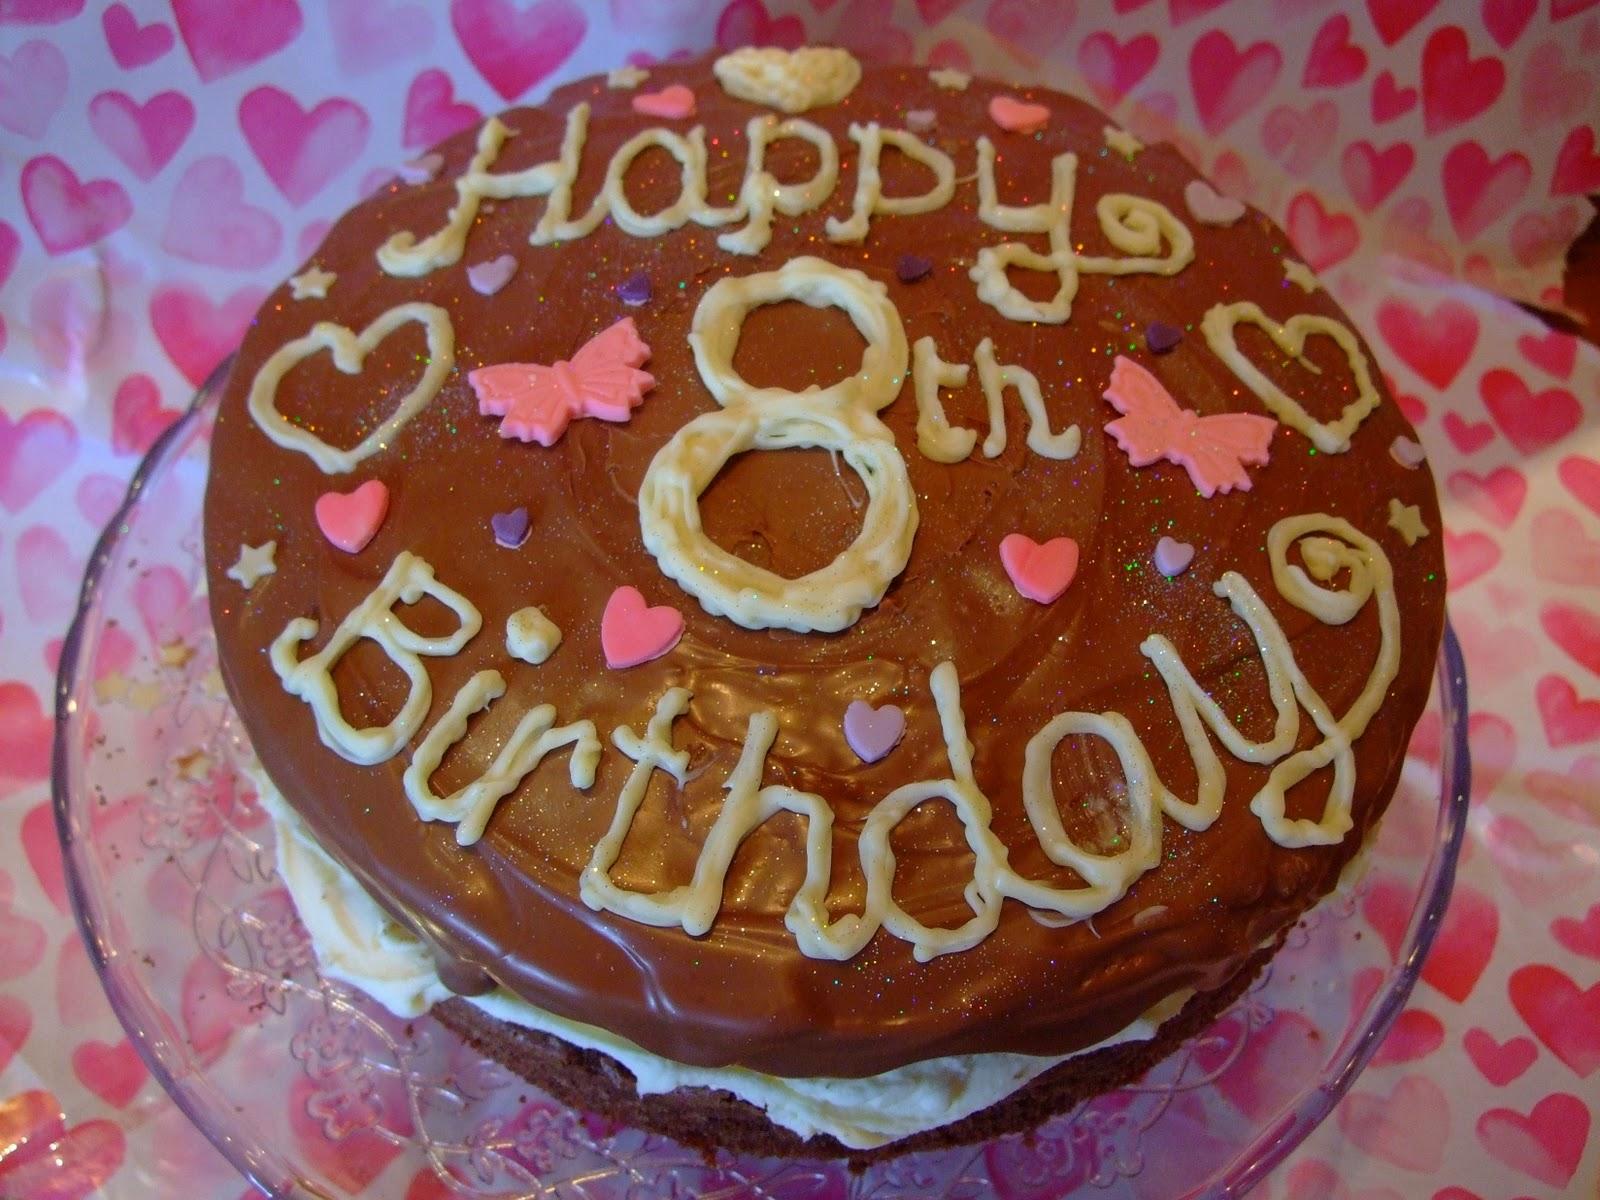 Colourful Cupcakes Of Newbury Delicious Birthday Cakes